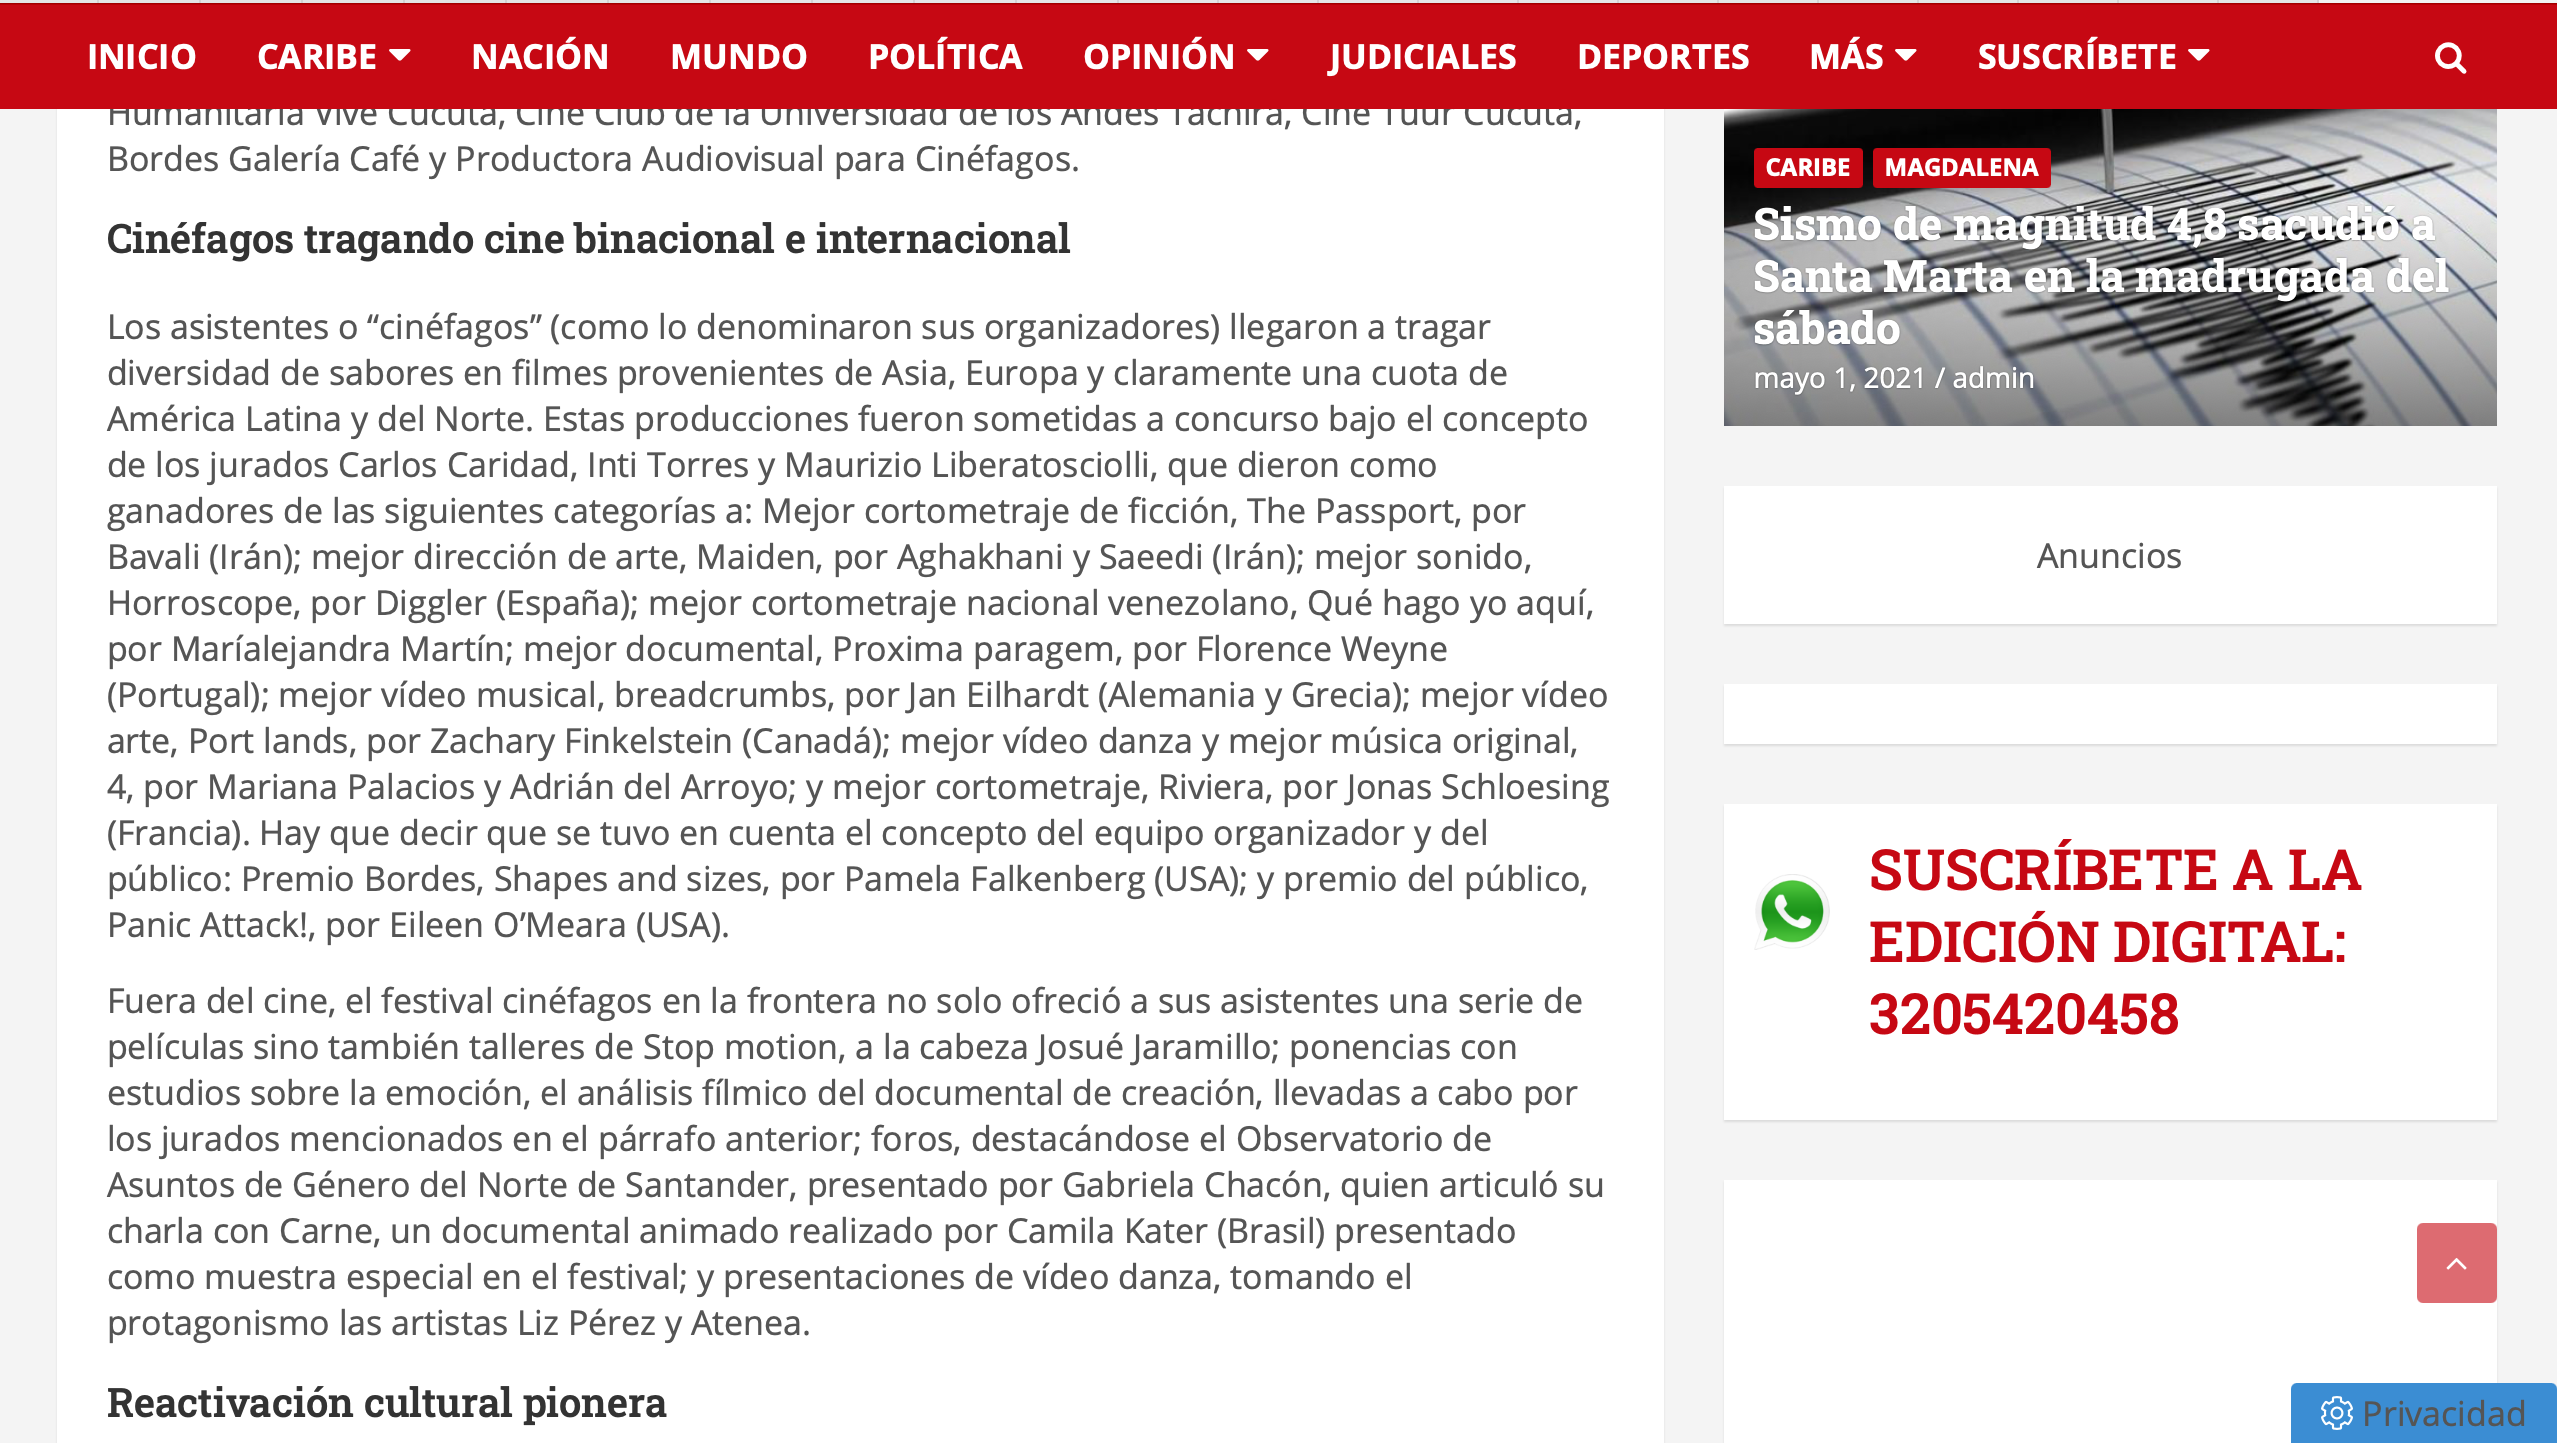 Diario del Norte 2 Screenshot 2021-05-02 at 19.58.28